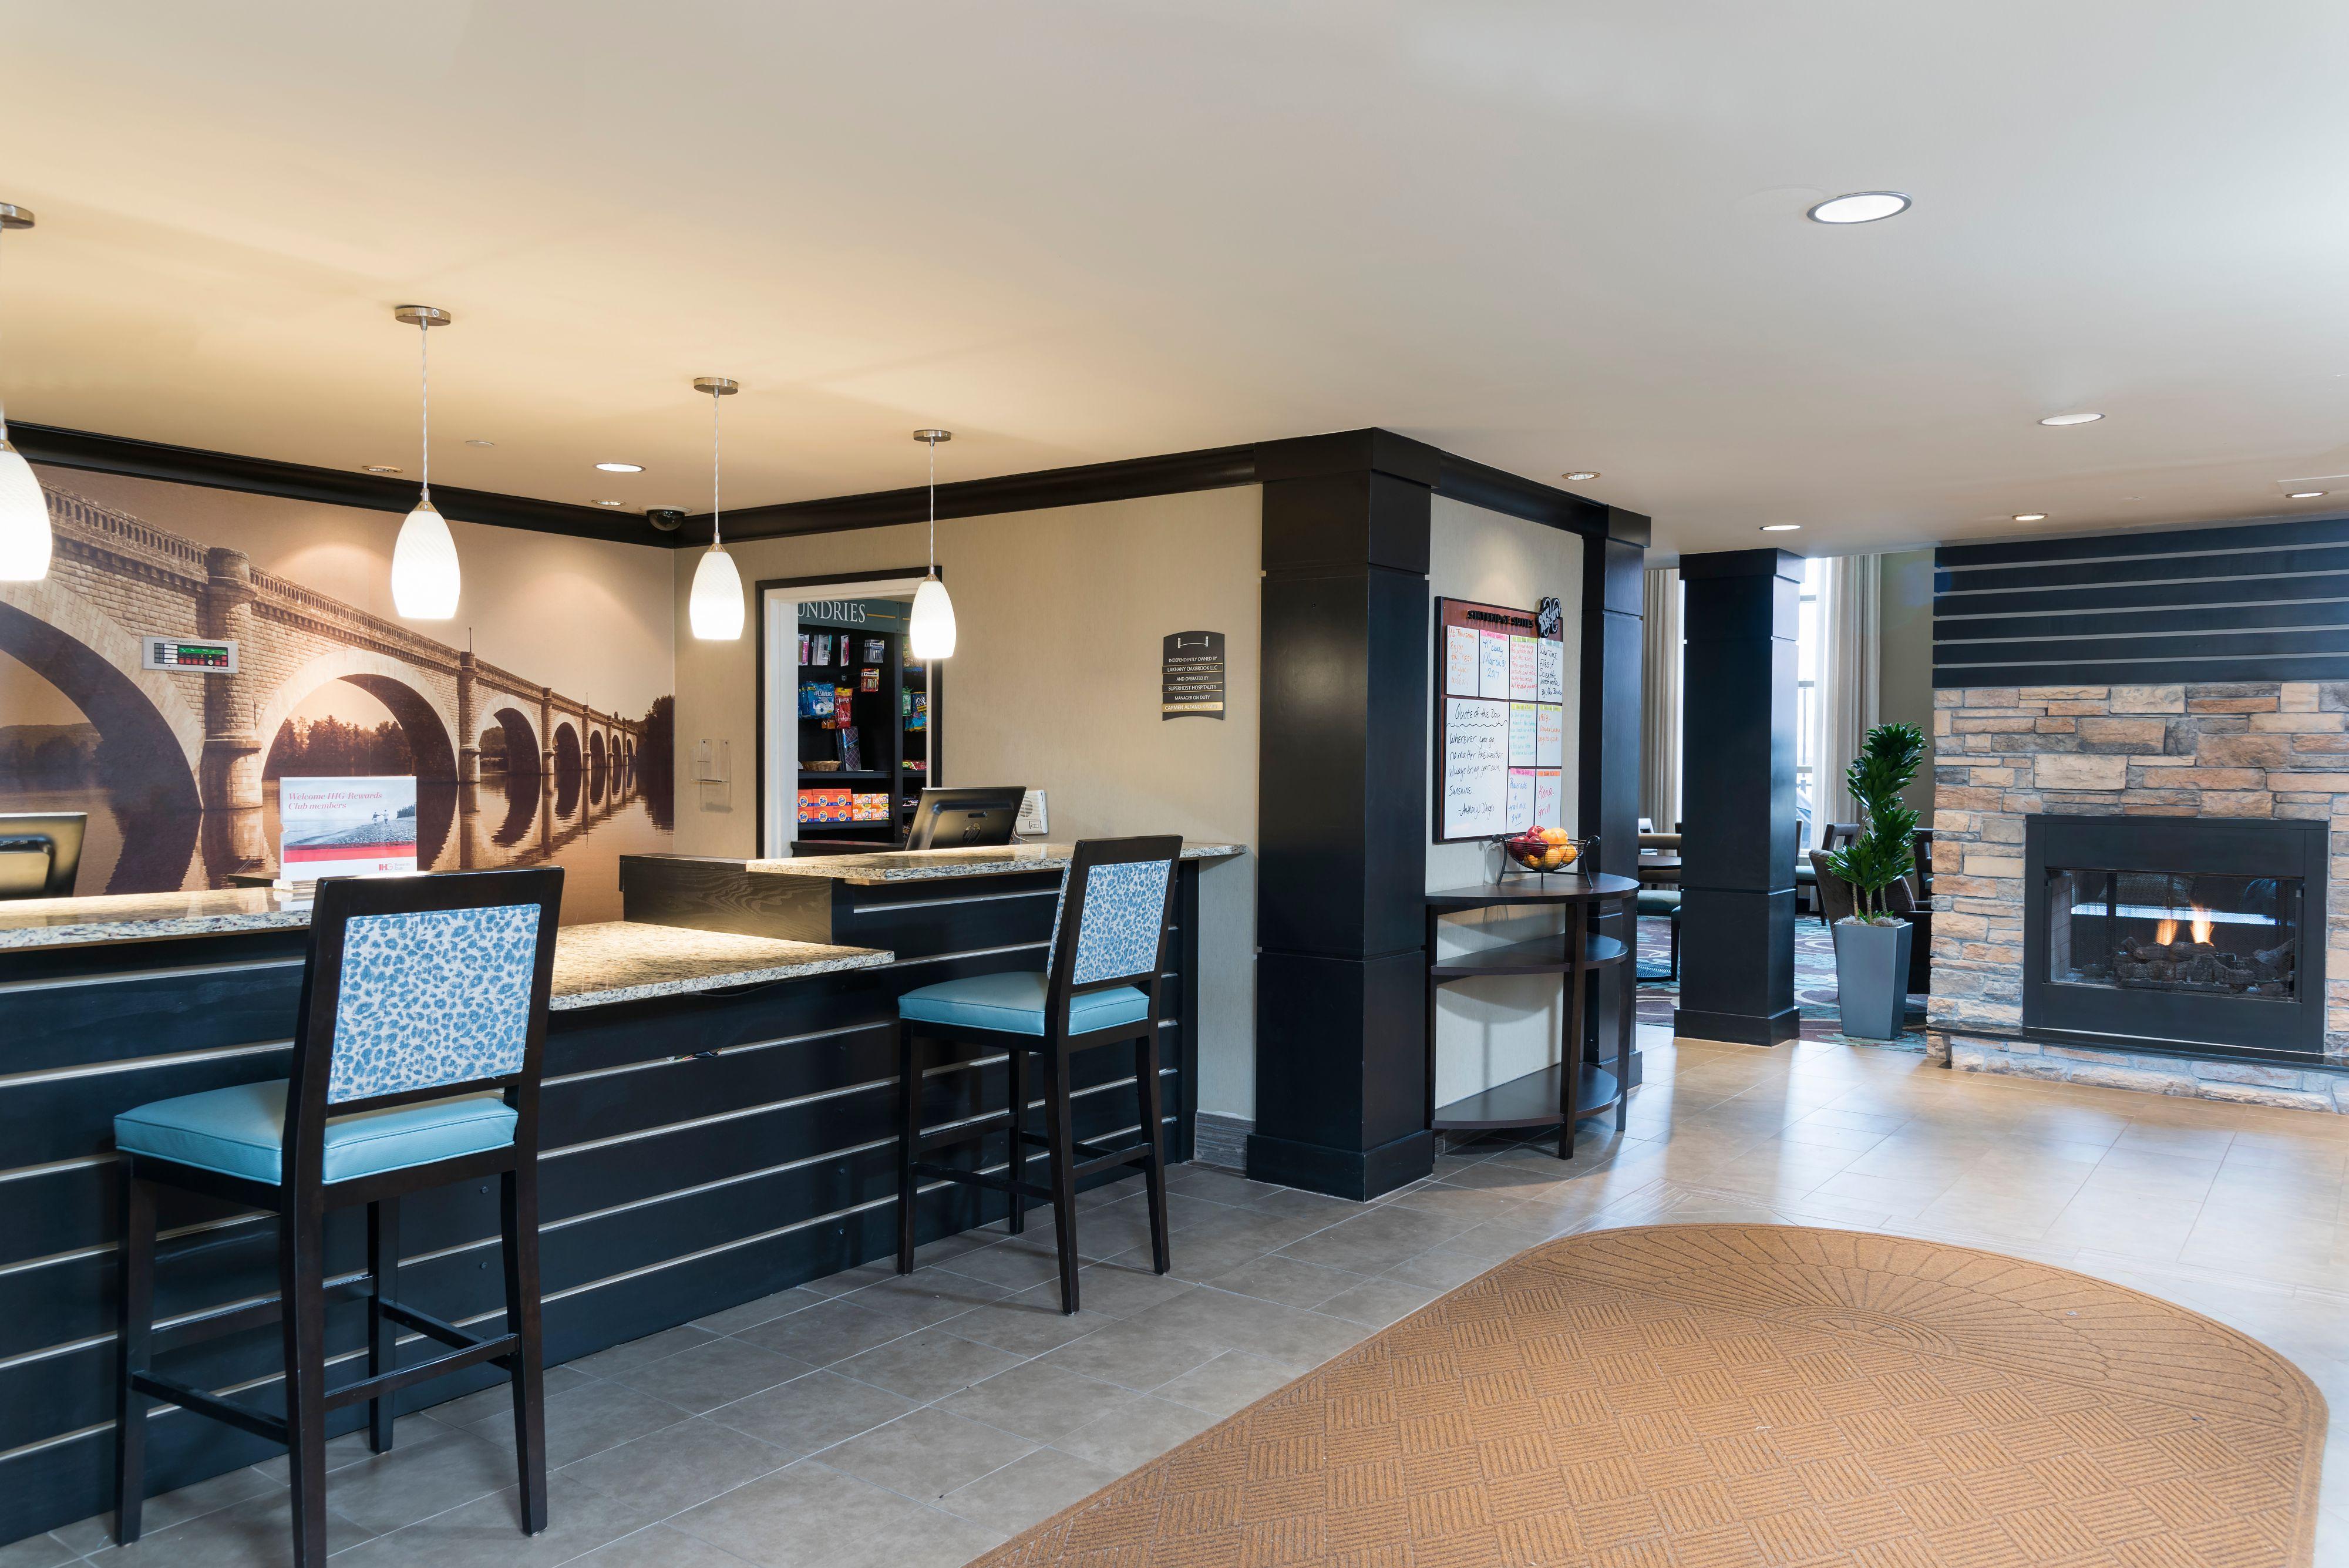 Staybridge Suites Chicago-Oakbrook Terrace image 4